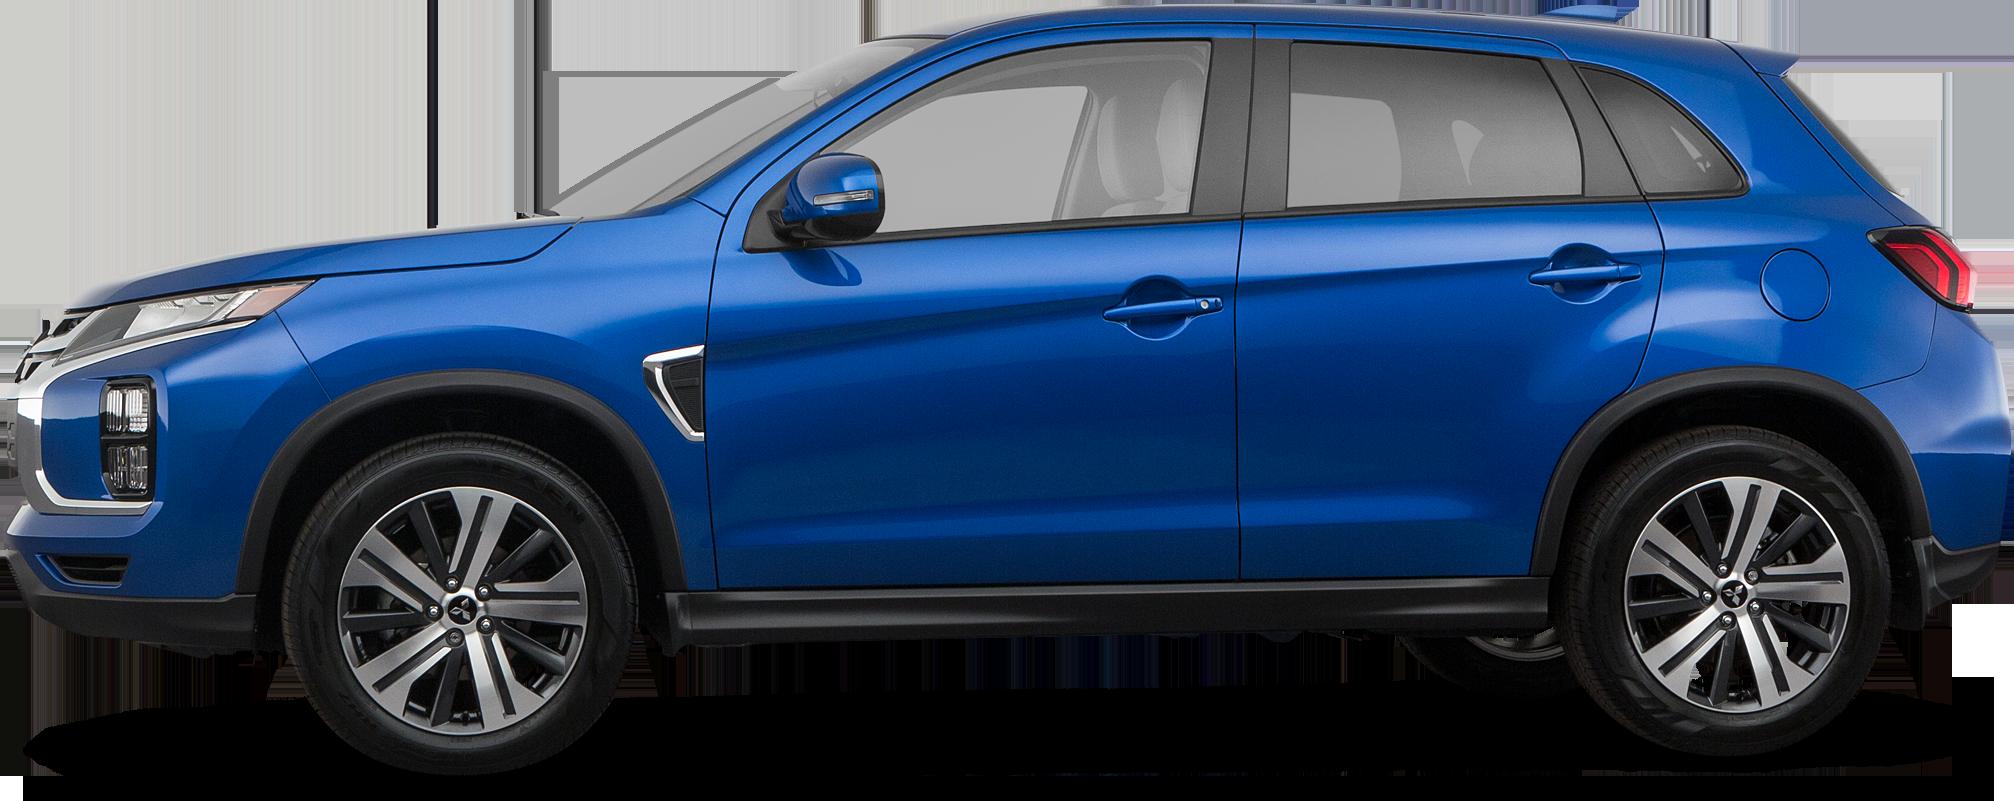 2020 Mitsubishi Outlander Sport CUV 2.0 SE